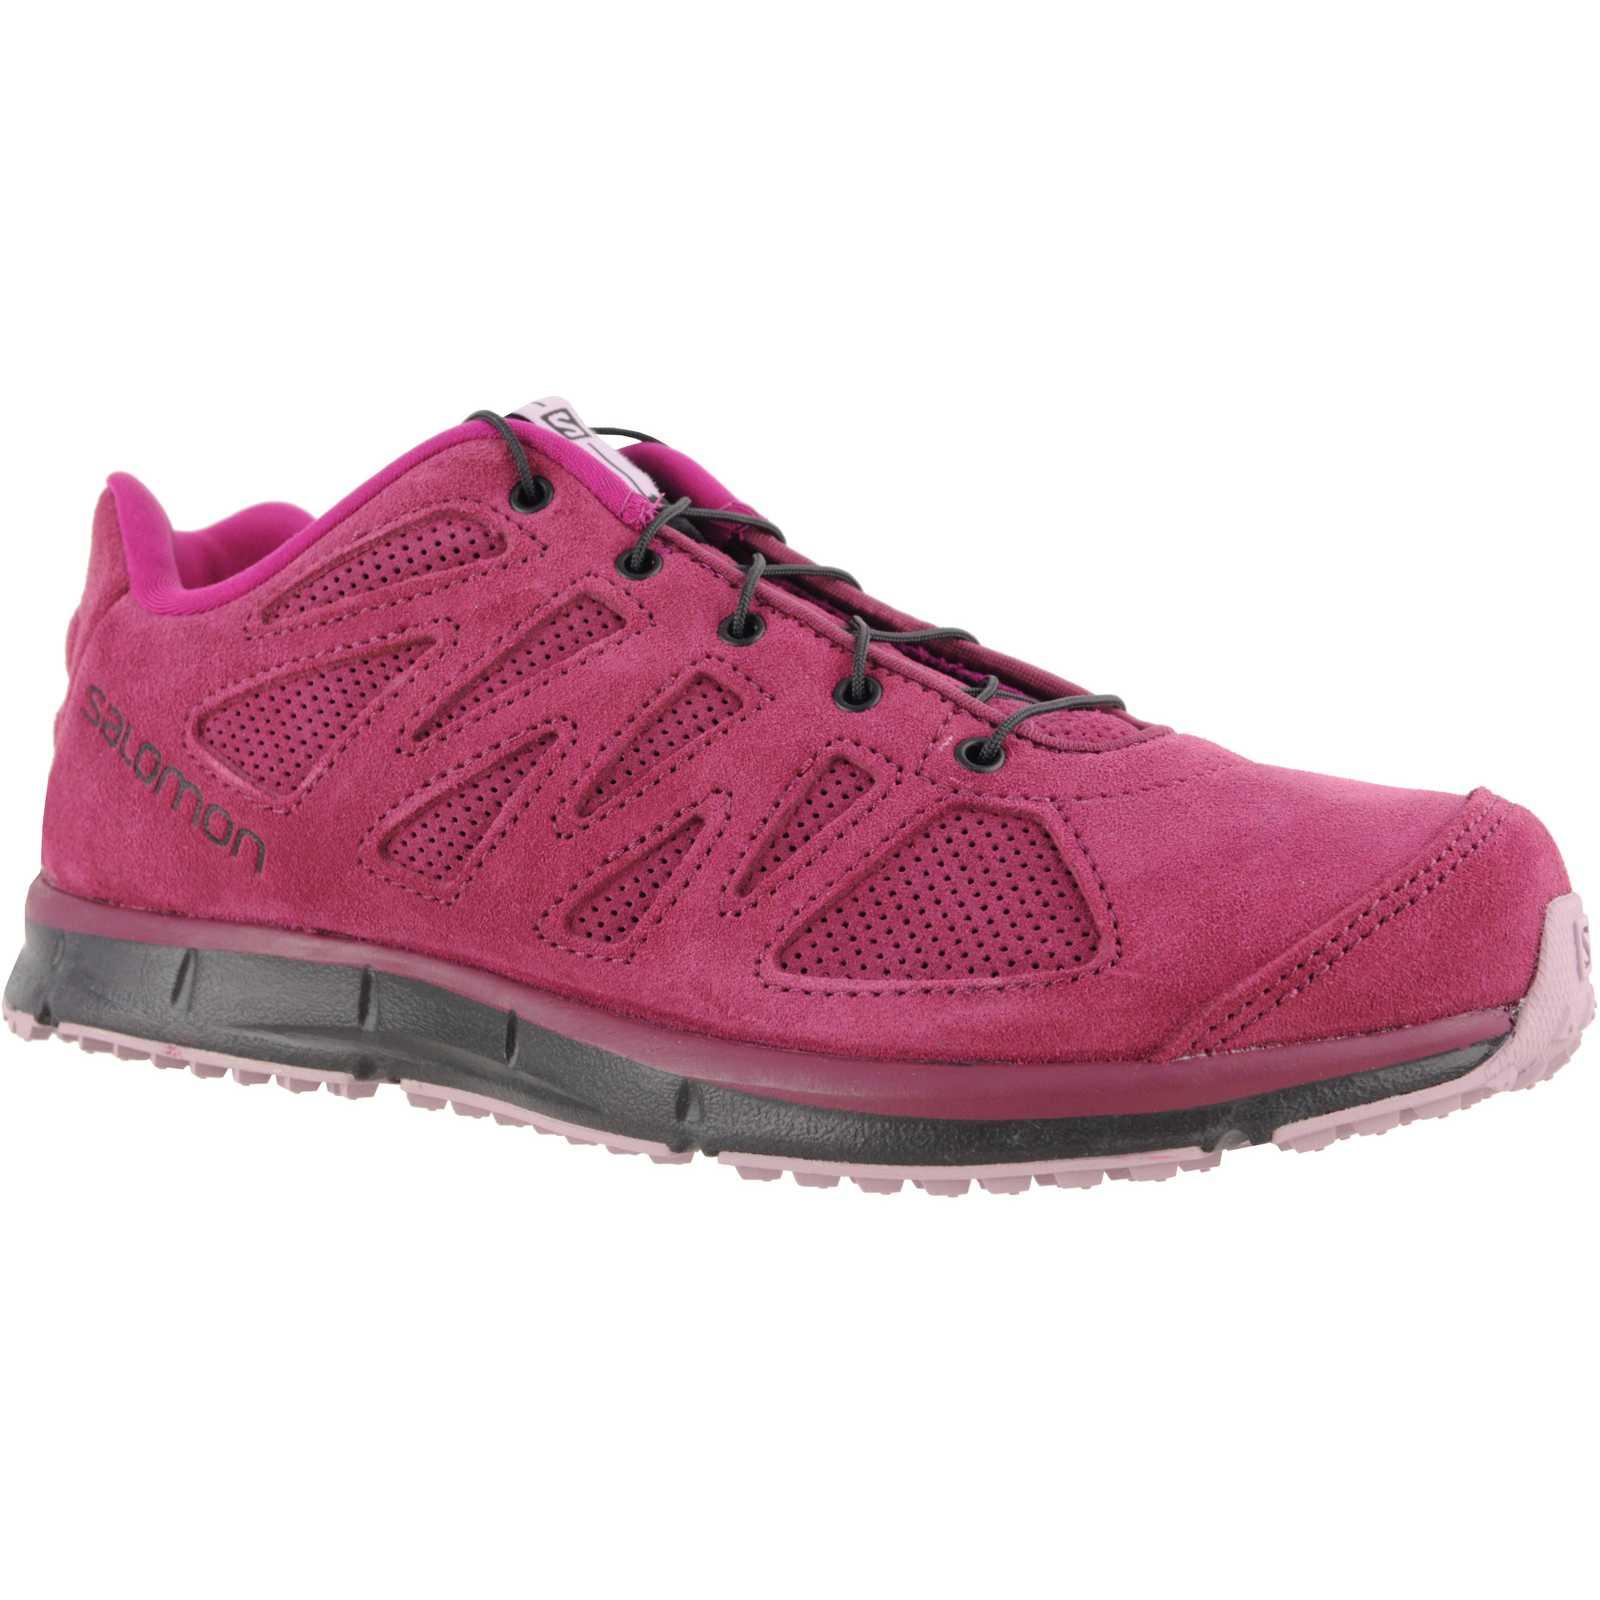 Pantofi sport femei Salomon Kalalau LTR 366647